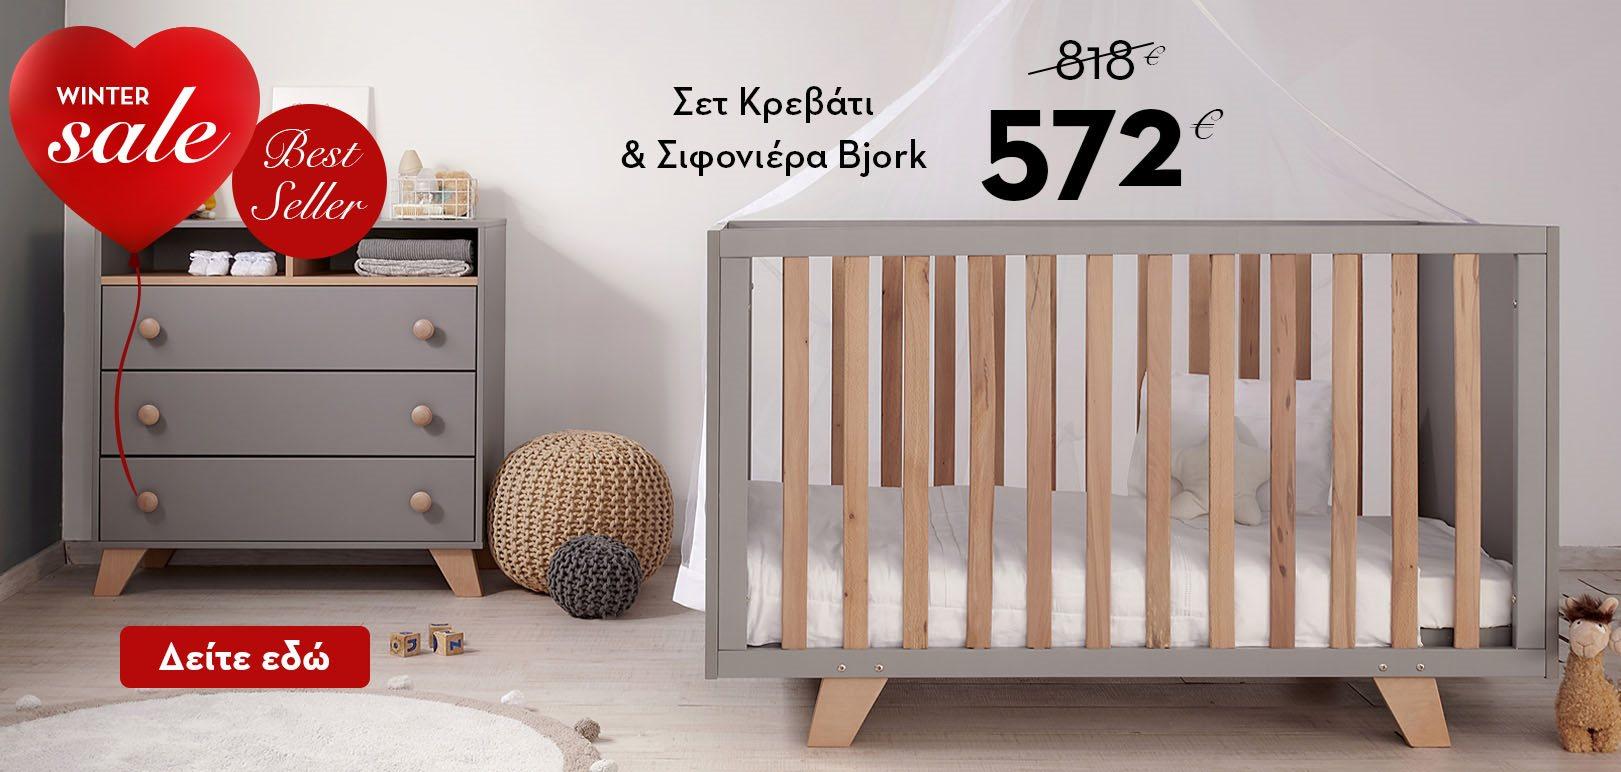 36486cac476 Προίκα Μωρού | Βρεφικά Δωμάτια | Έπιπλα για μωρά | ΗΡΑ